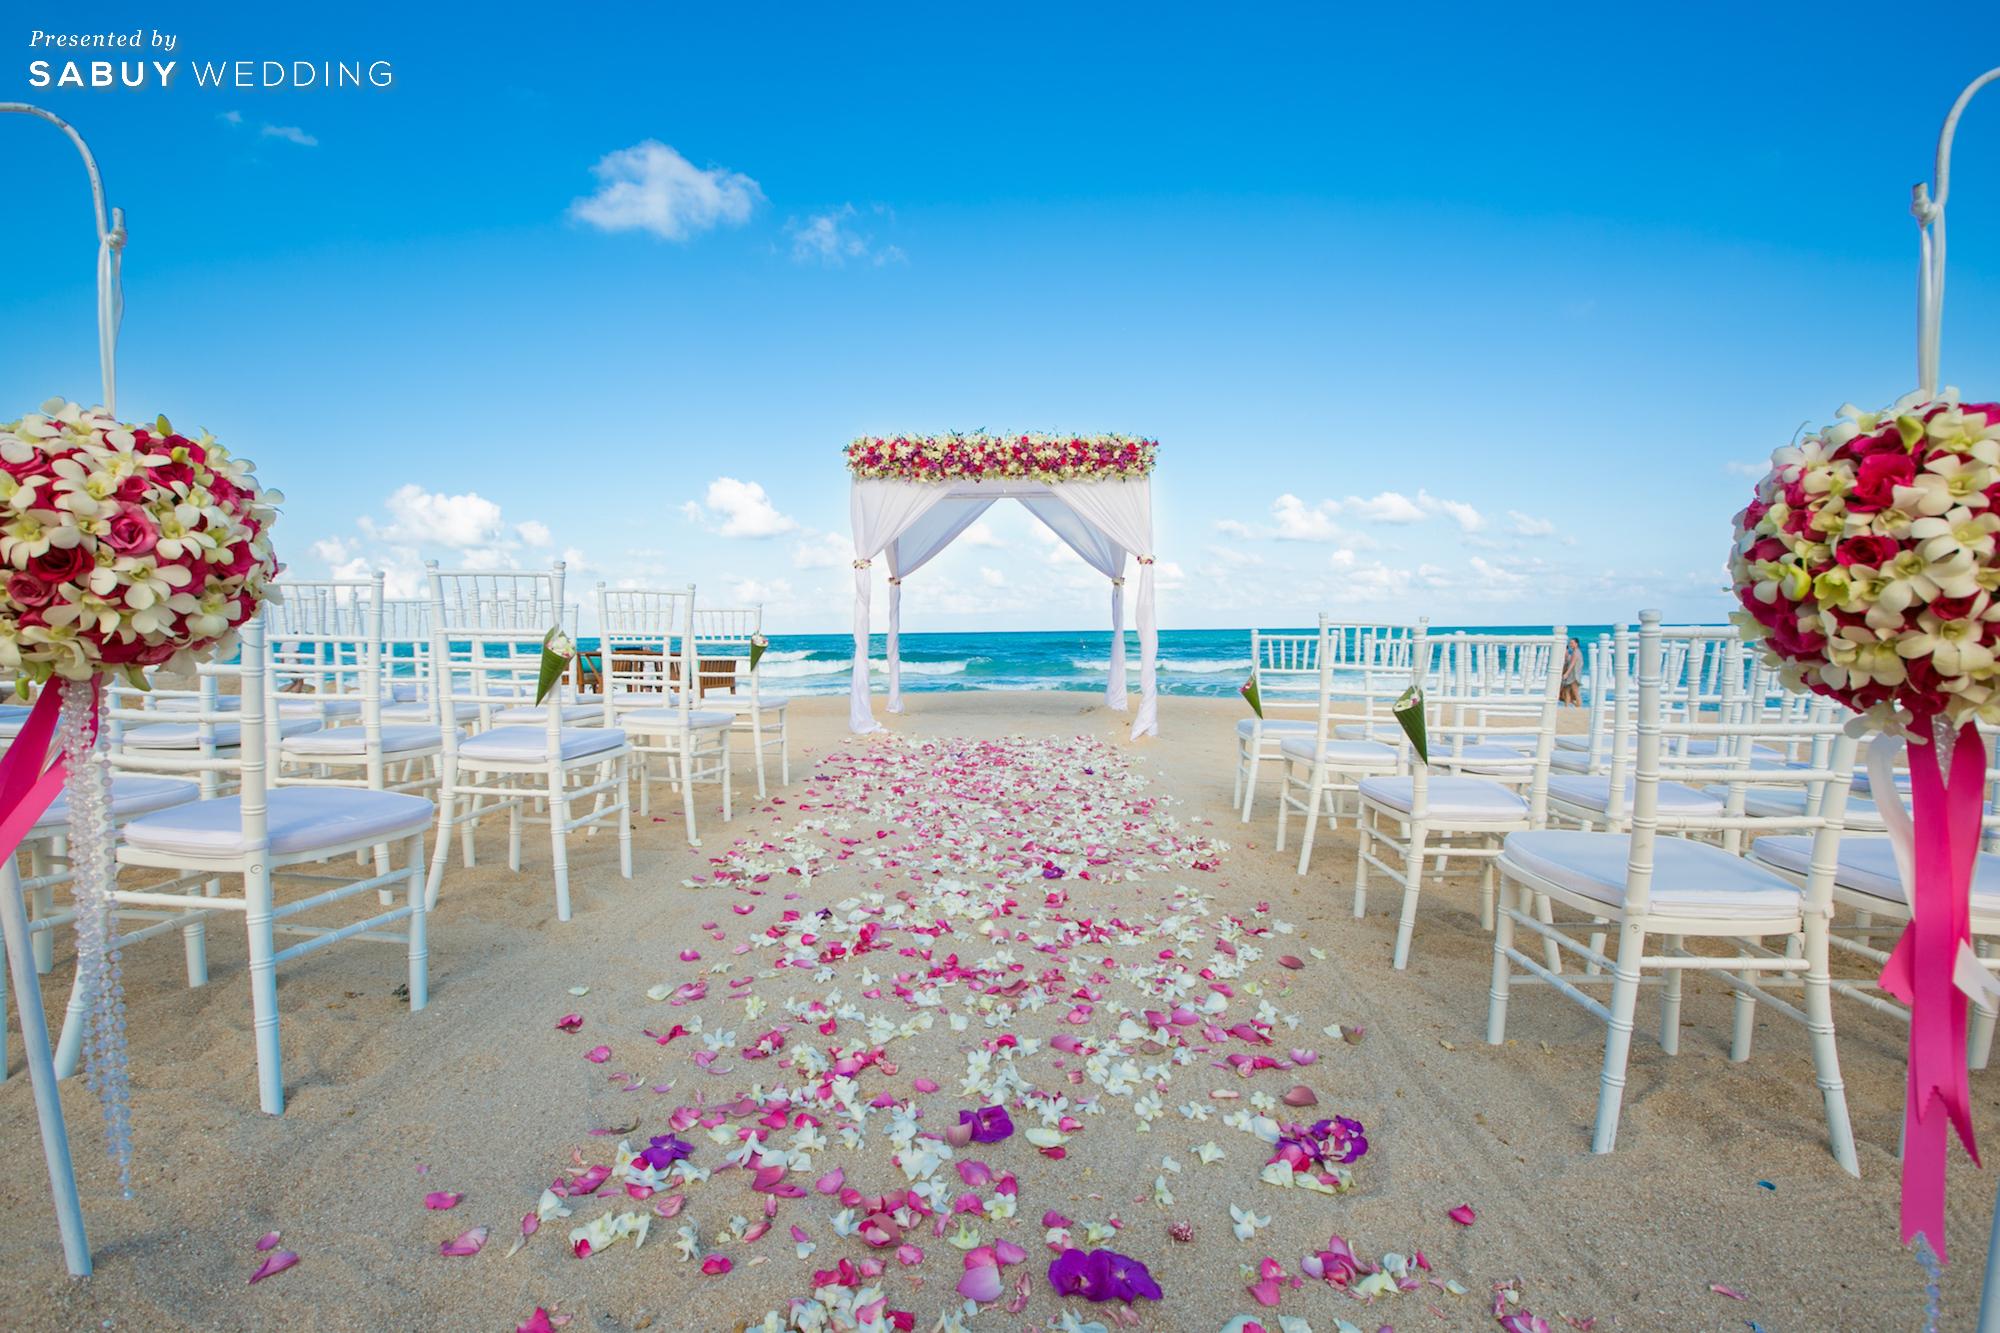 SHERATON SAMUI RESORT,Marriott Wedding Thailand,แมริออท ประเทศไทย,สถานที่แต่งงาน,สถานที่จัดงานแต่งงาน,โรงแรม,งานแต่งงาน,งานแต่ง outdoor,งานแต่งริมทะเล,งานแต่งชายทะเล ครบทุกความต้องการของบ่าวสาว กับ 40 สถานที่แต่งงานในเครือ Marriott